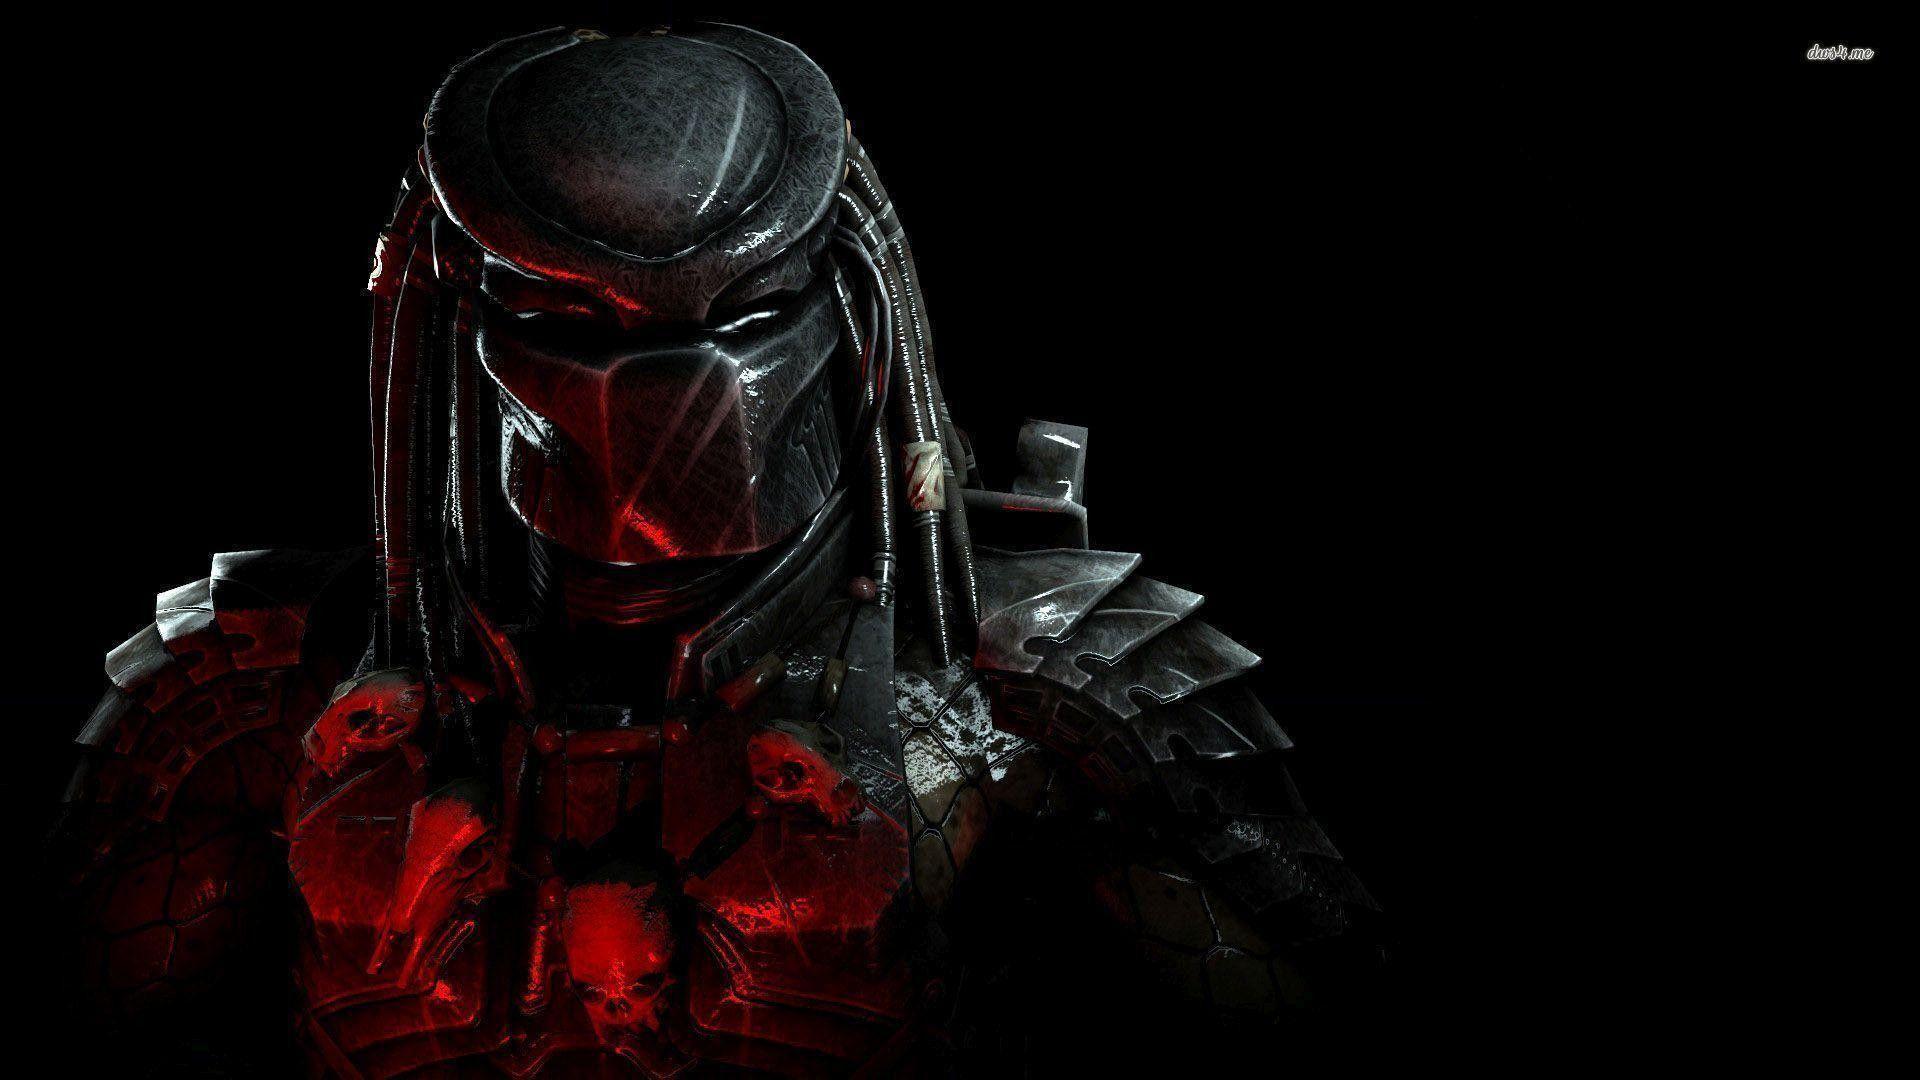 1080p Predator Wallpaper Hd - Wallpaper For You